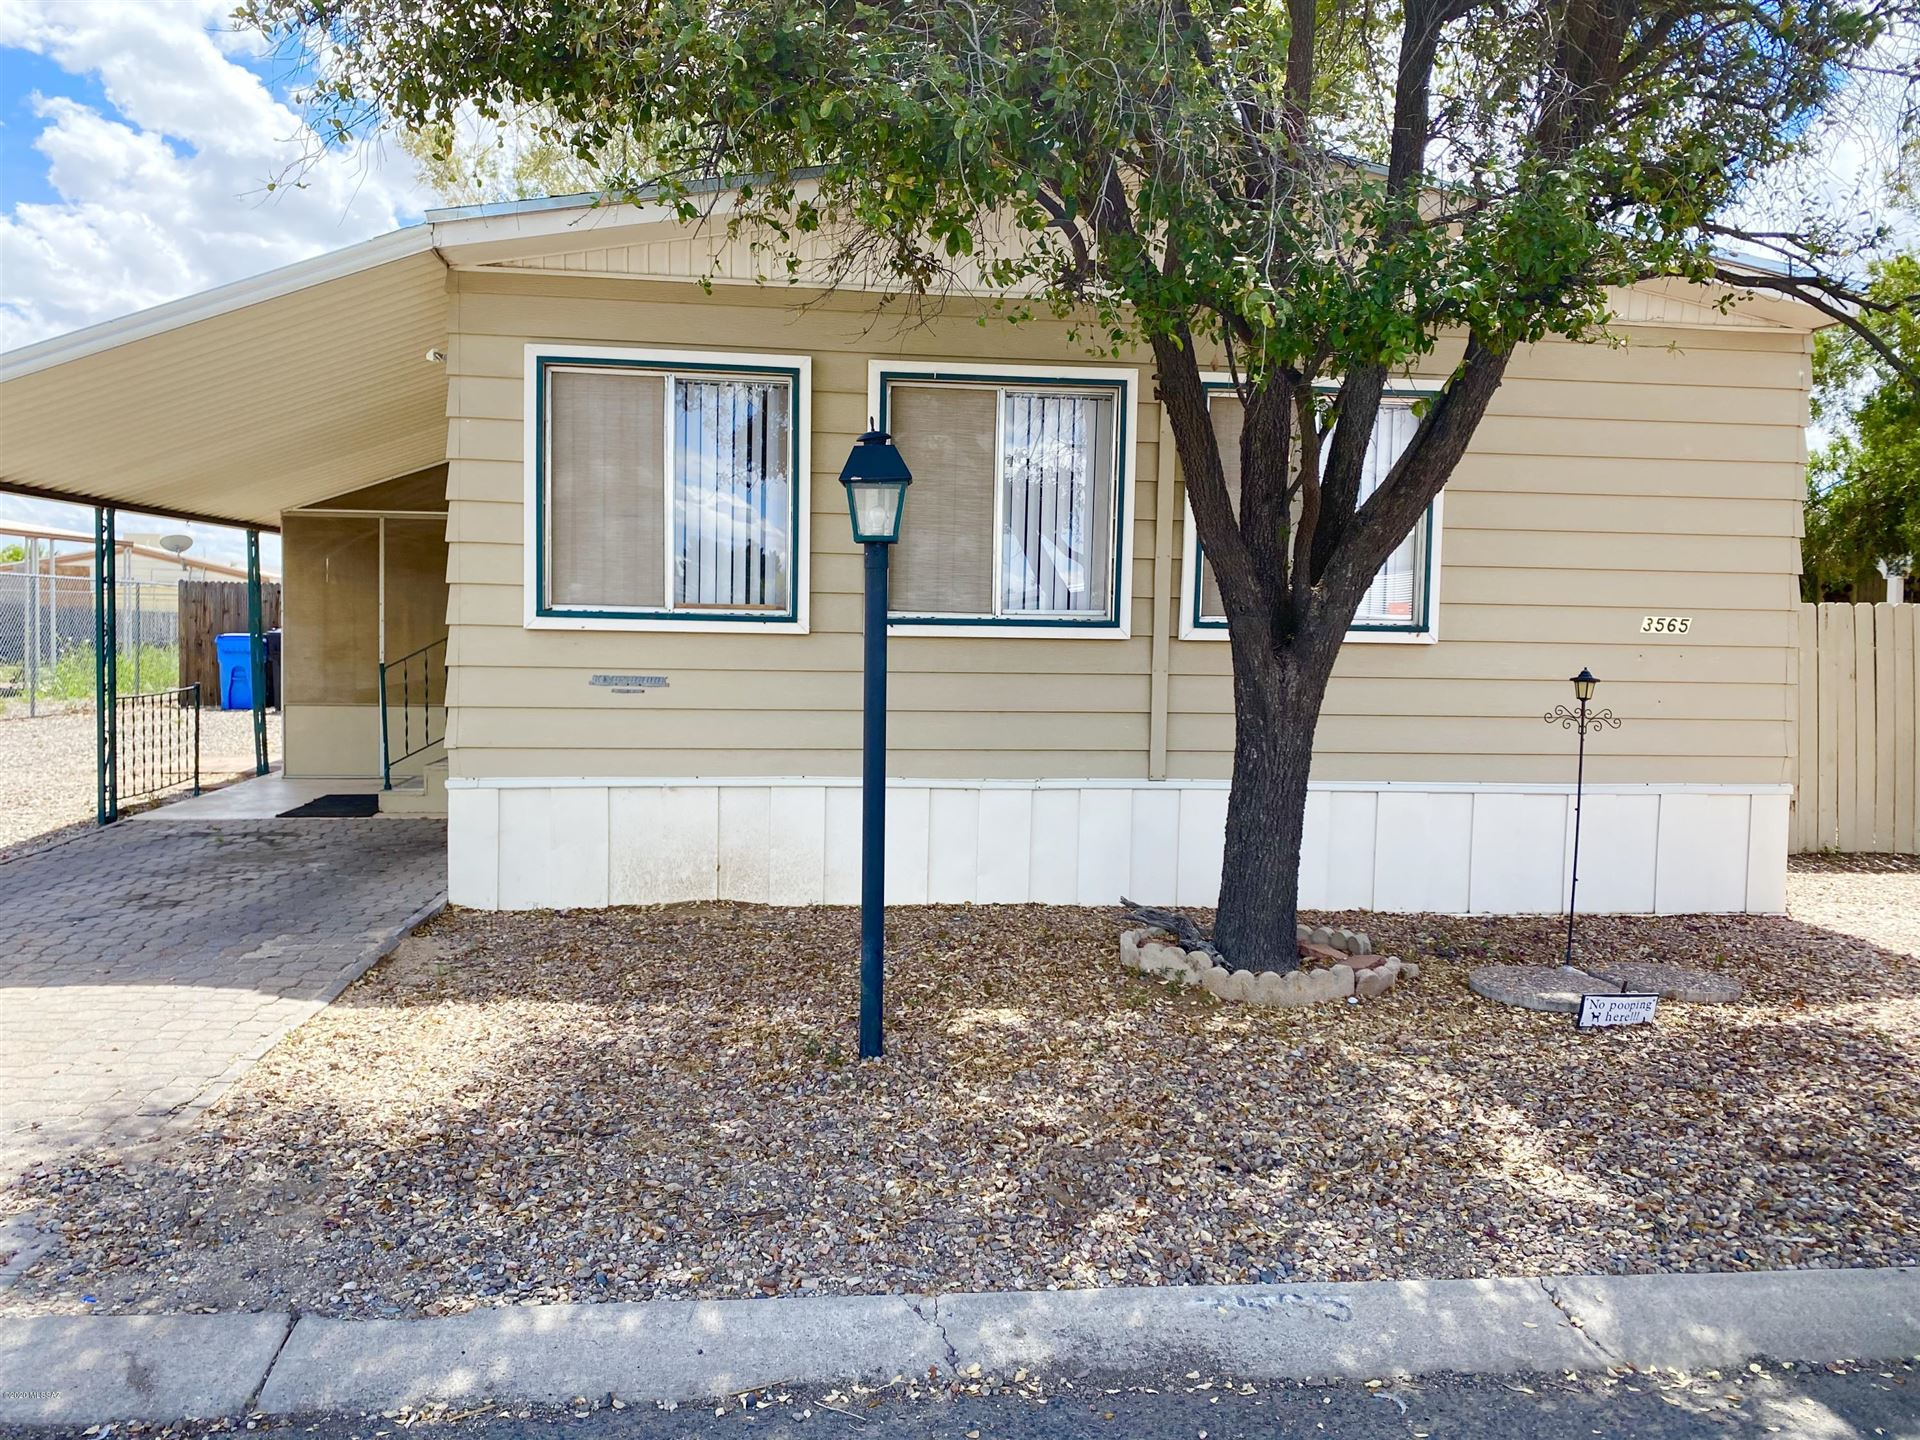 3565 W Mango Drive, Tucson, AZ 85741 - MLS#: 22010807